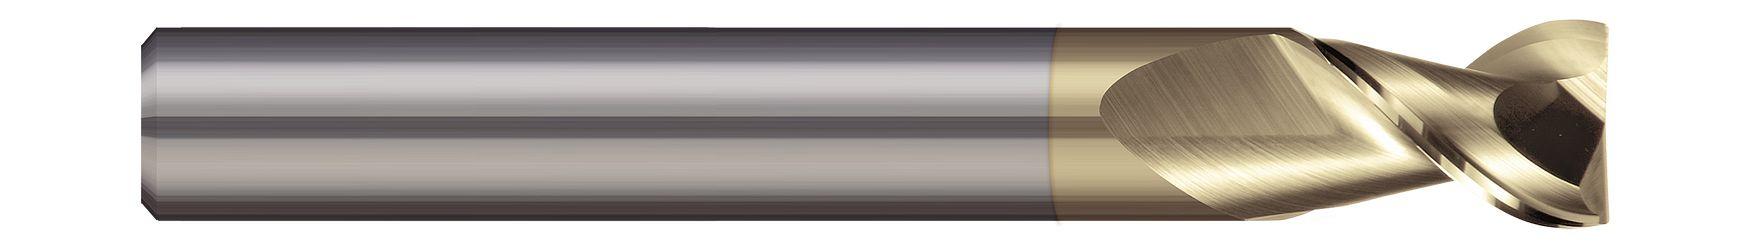 tool-details-ASM-500-2S